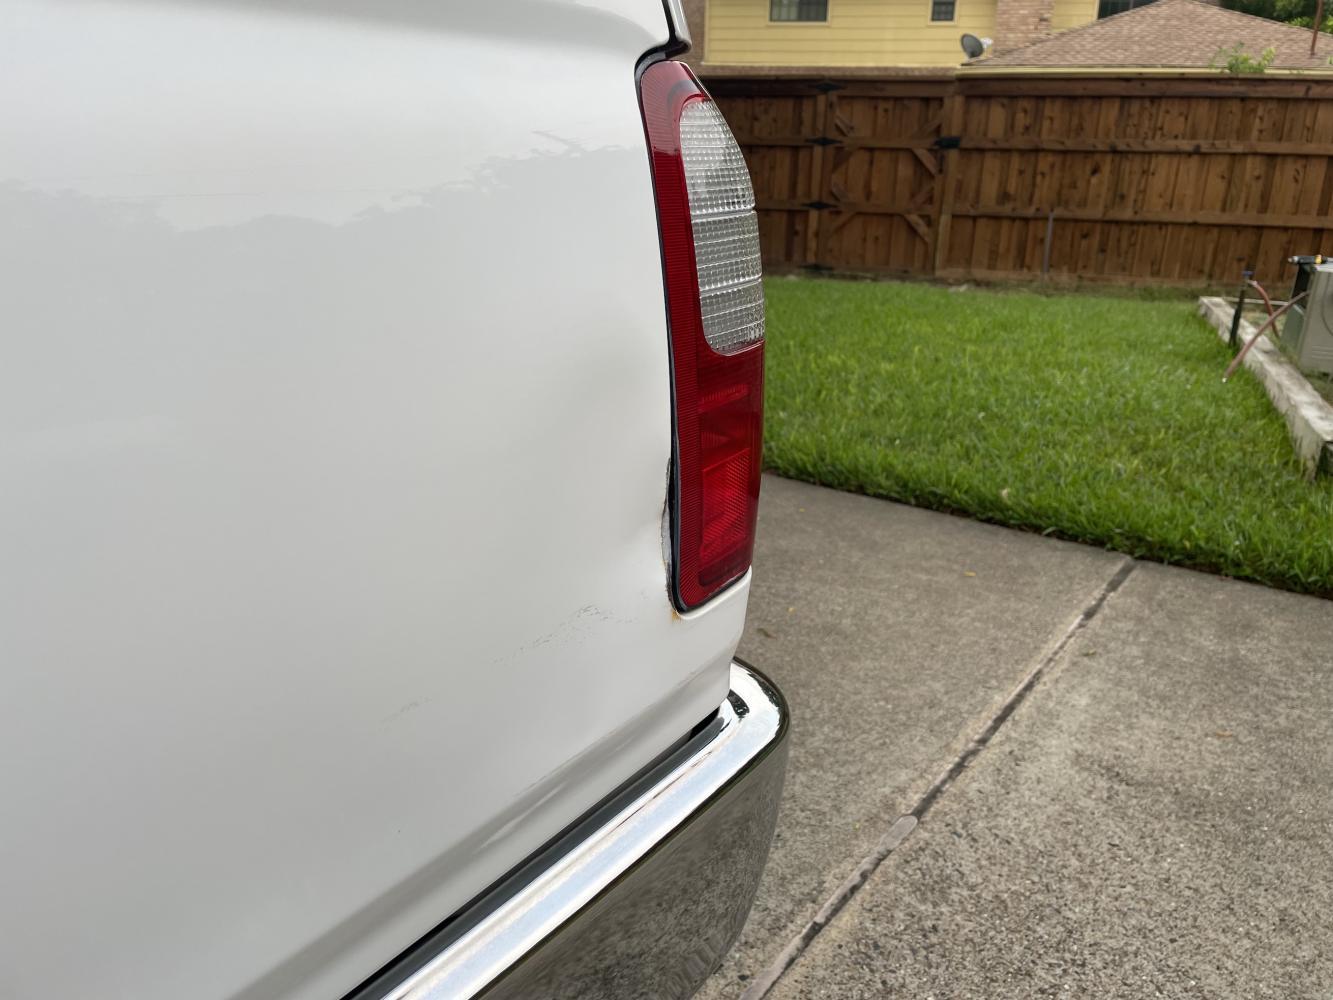 SOLD: 2000 4Runner SR5, 5-speed manual 4WD, 227K, ,500; Richardson, TX-img_3830-jpg